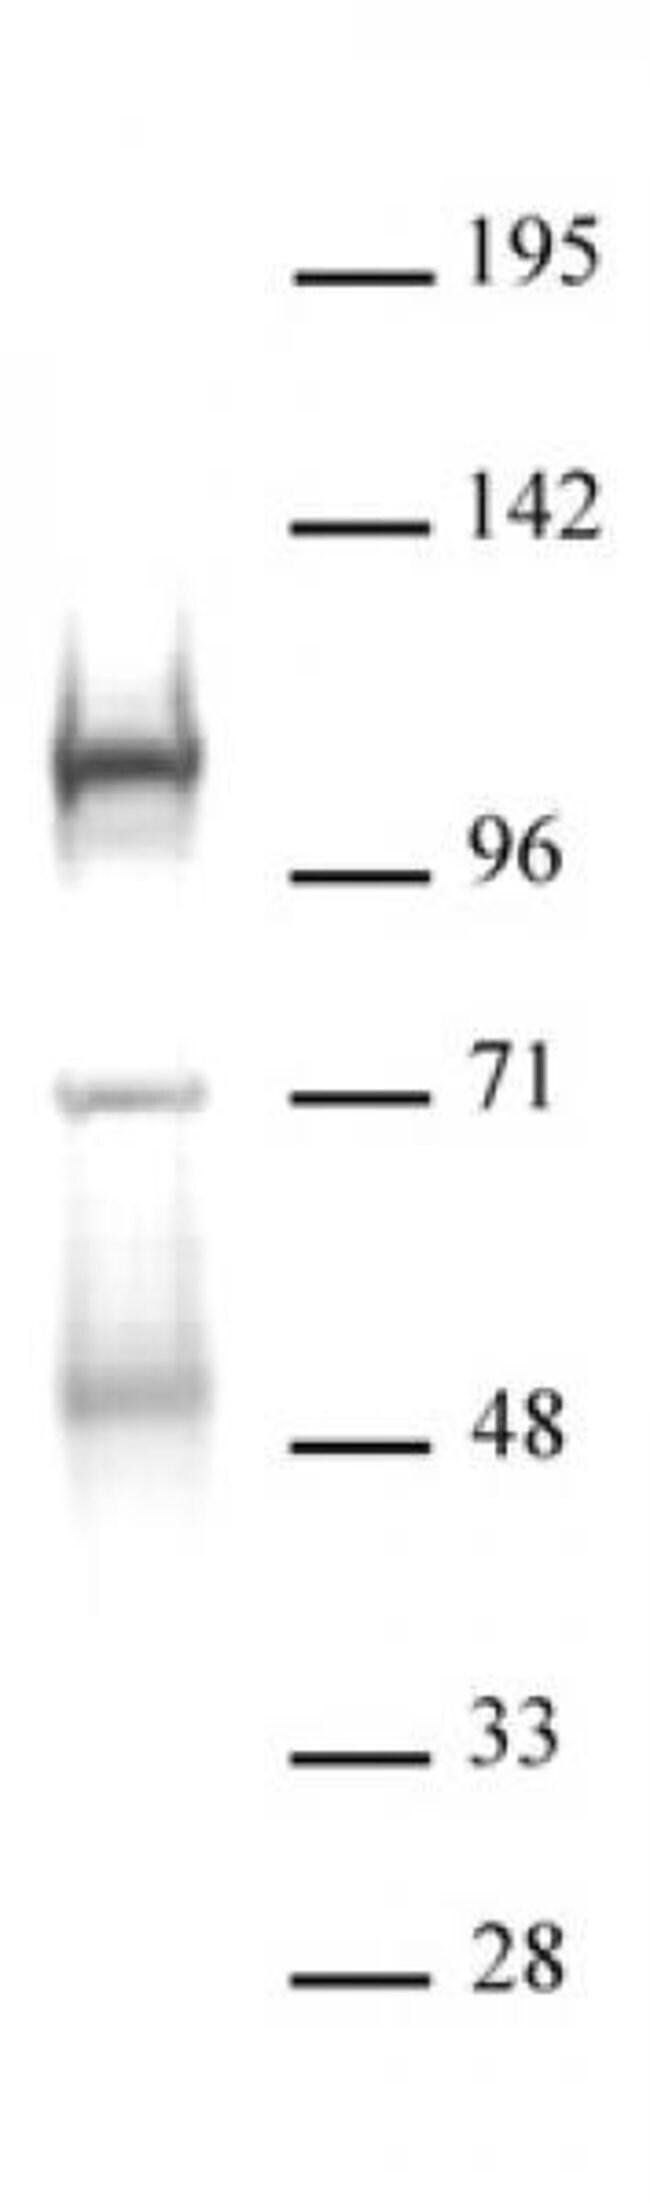 DNMT3B Rabbit anti-Mouse, Unconjugated, Polyclonal, Active Motif:Antibodies:Primary